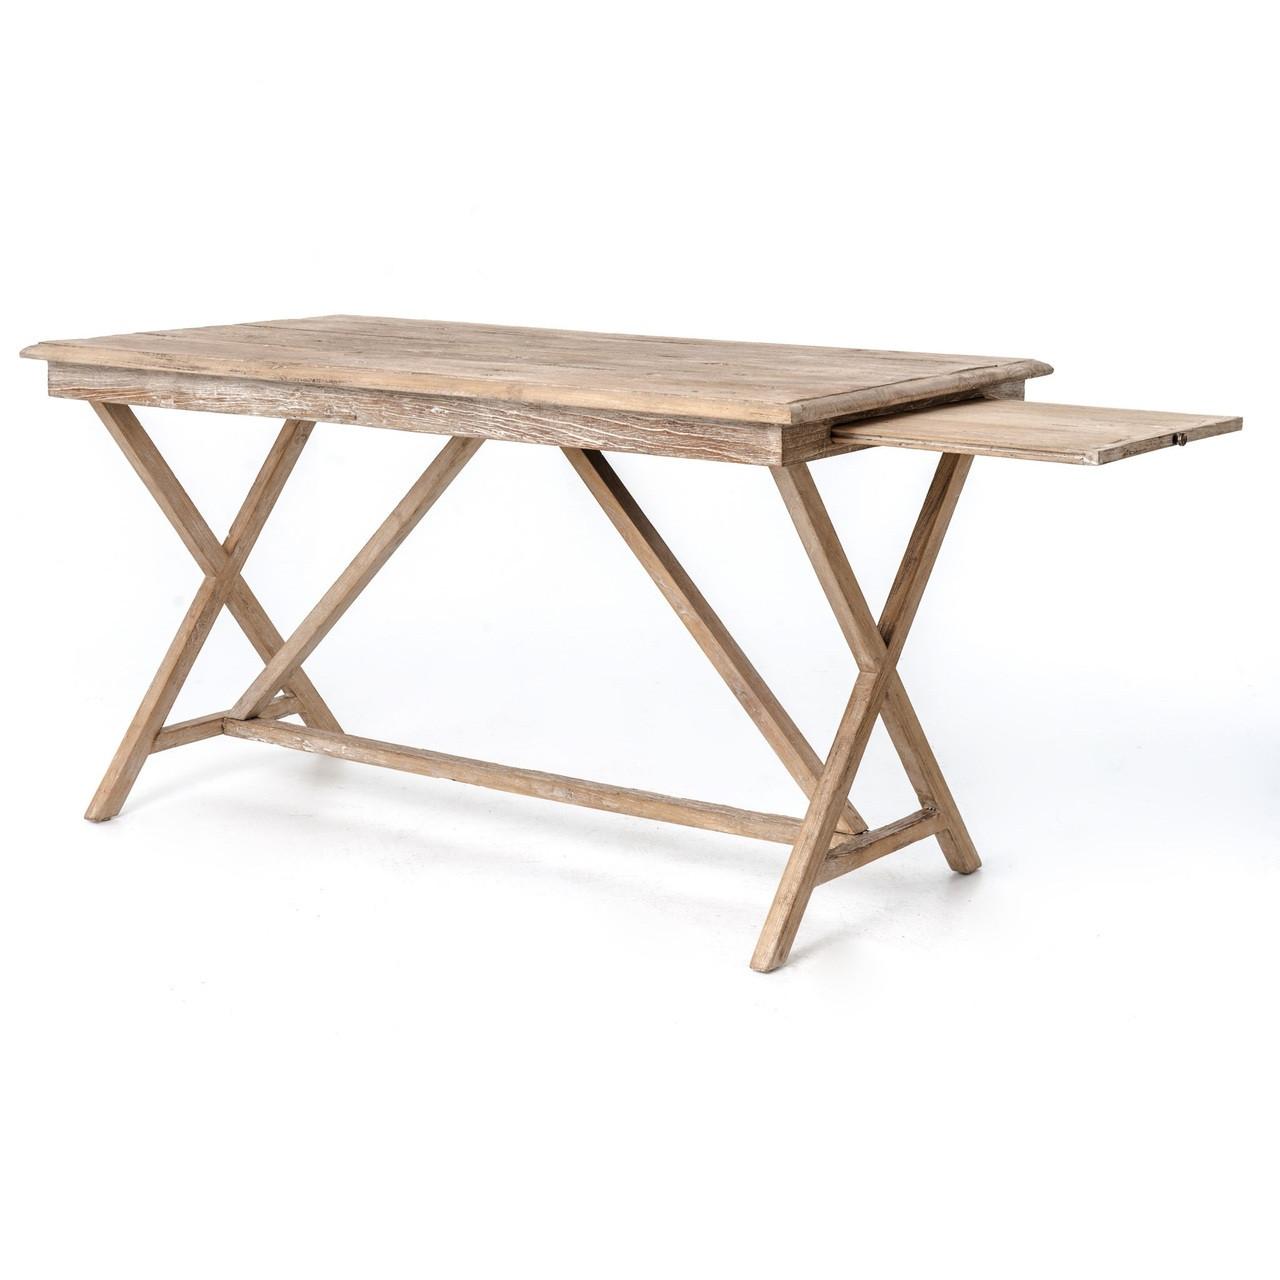 Rustic Americana Hardwood Executive Desk Home Office: Palma Rustic Whitewash Reclaimed Wood Desk